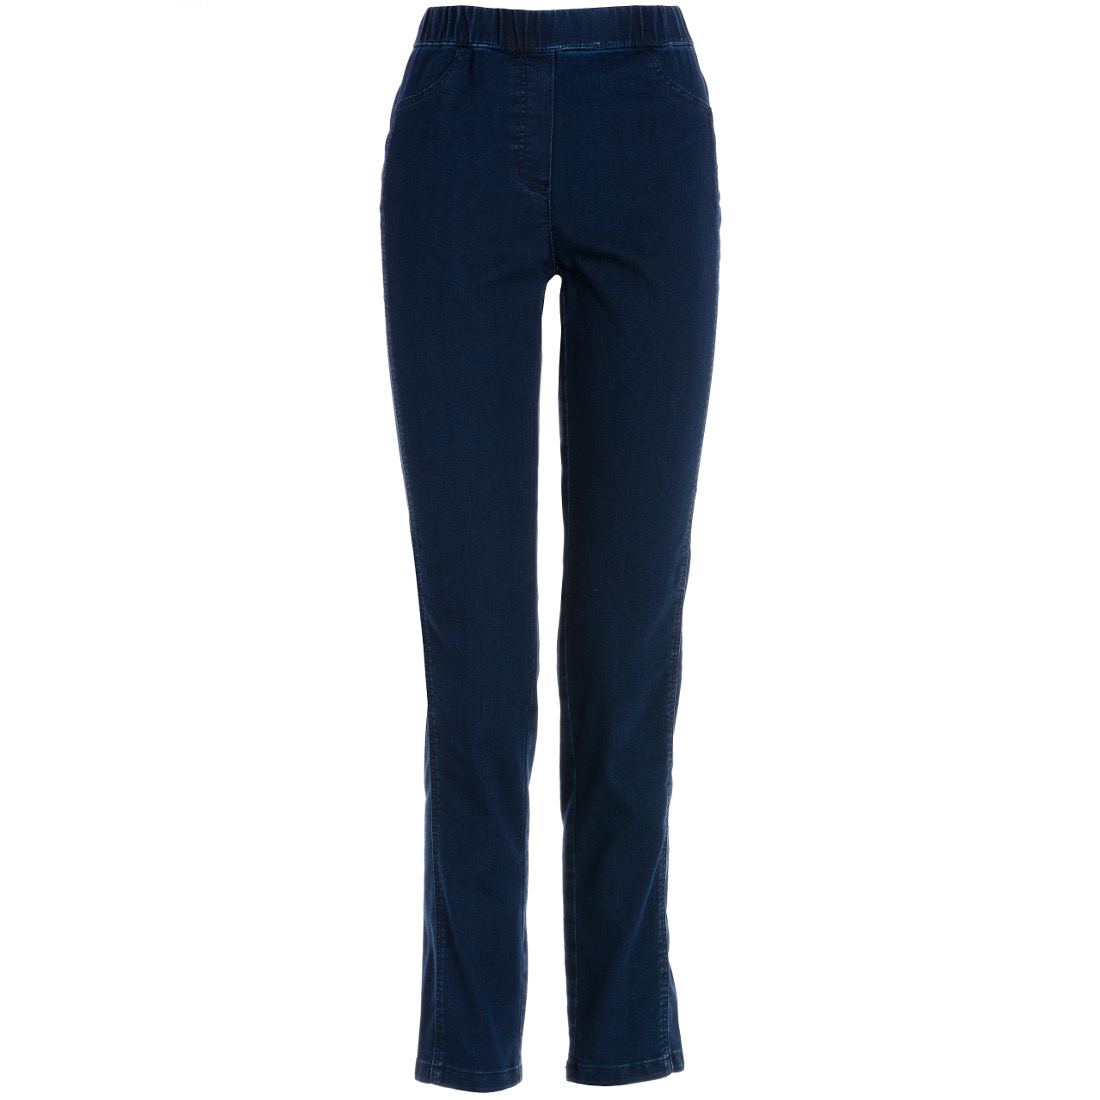 Frank Walder jeans 707650 in het Denim